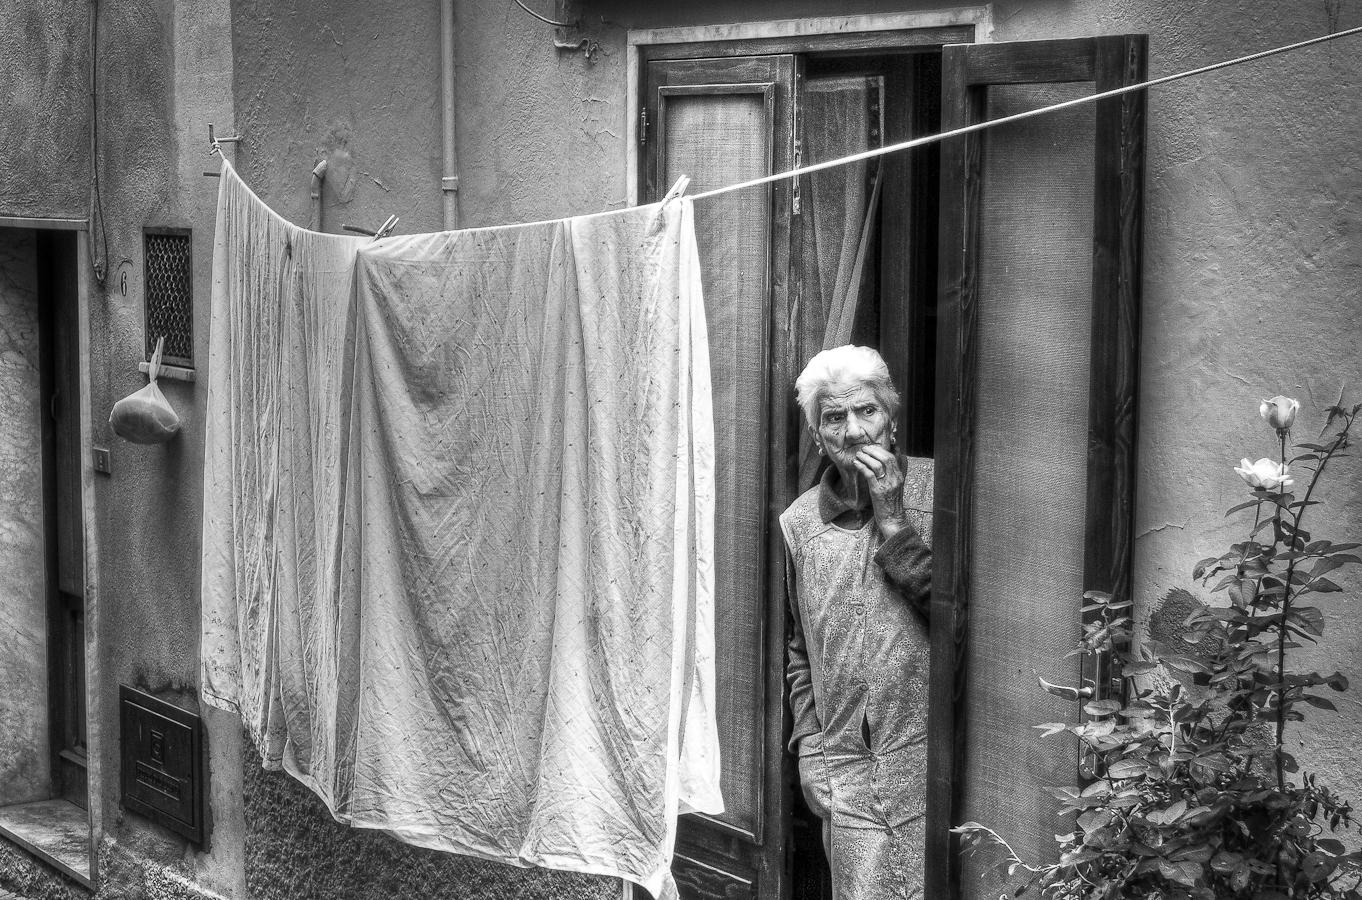 Carmelo Eramo (Italy) - Street Photographer - www.flavors.me/10dicembre